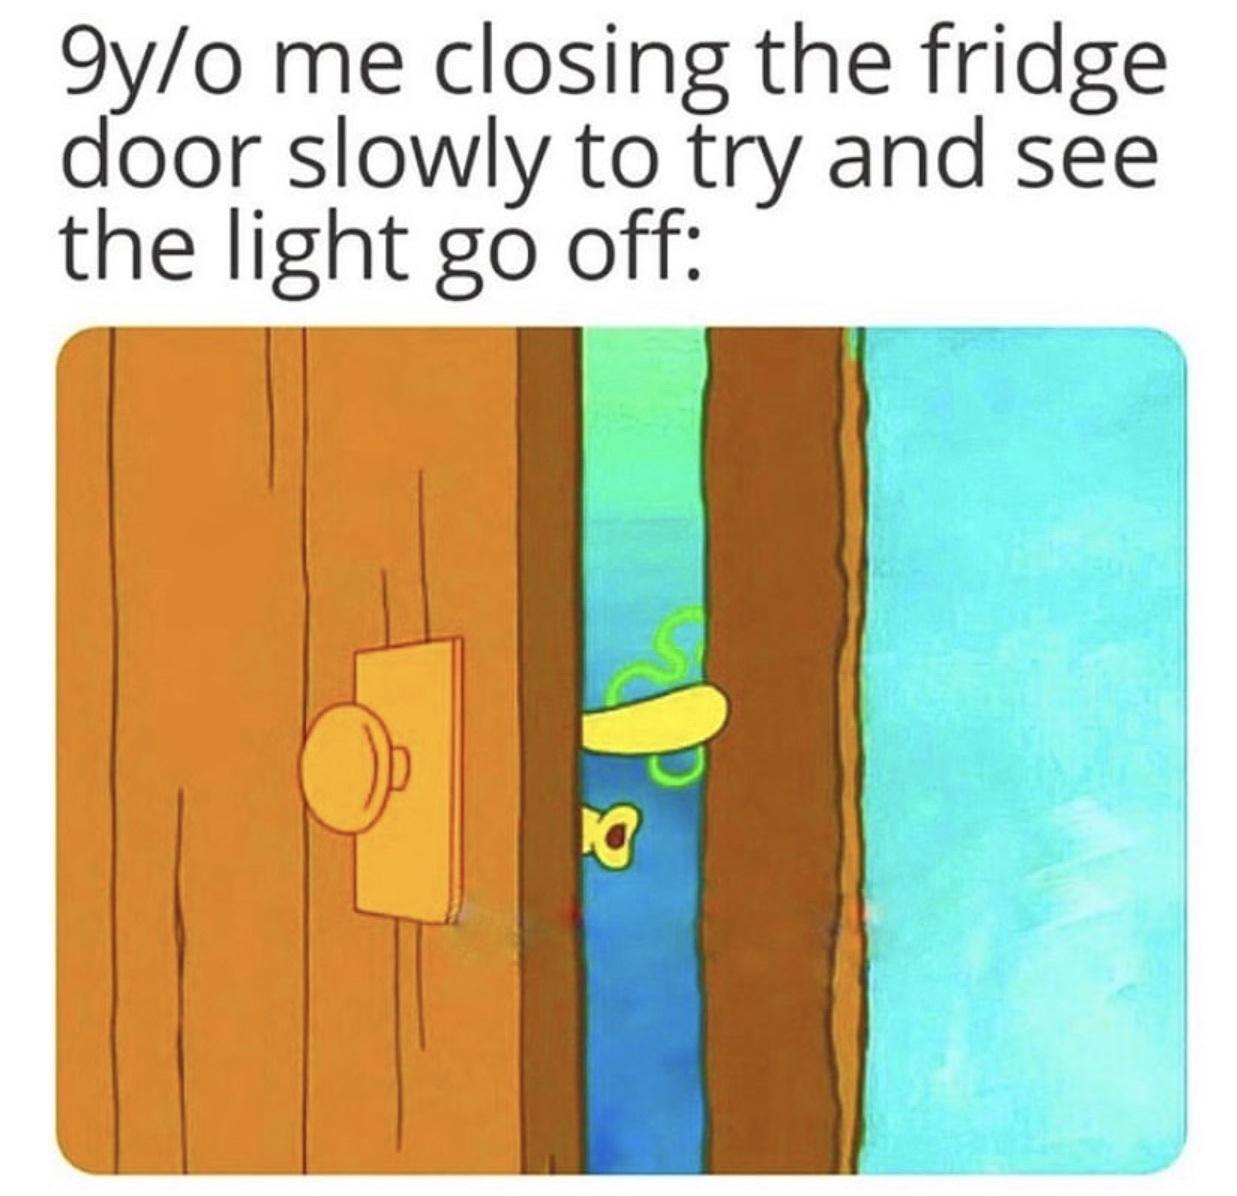 I've definitely done this before - meme